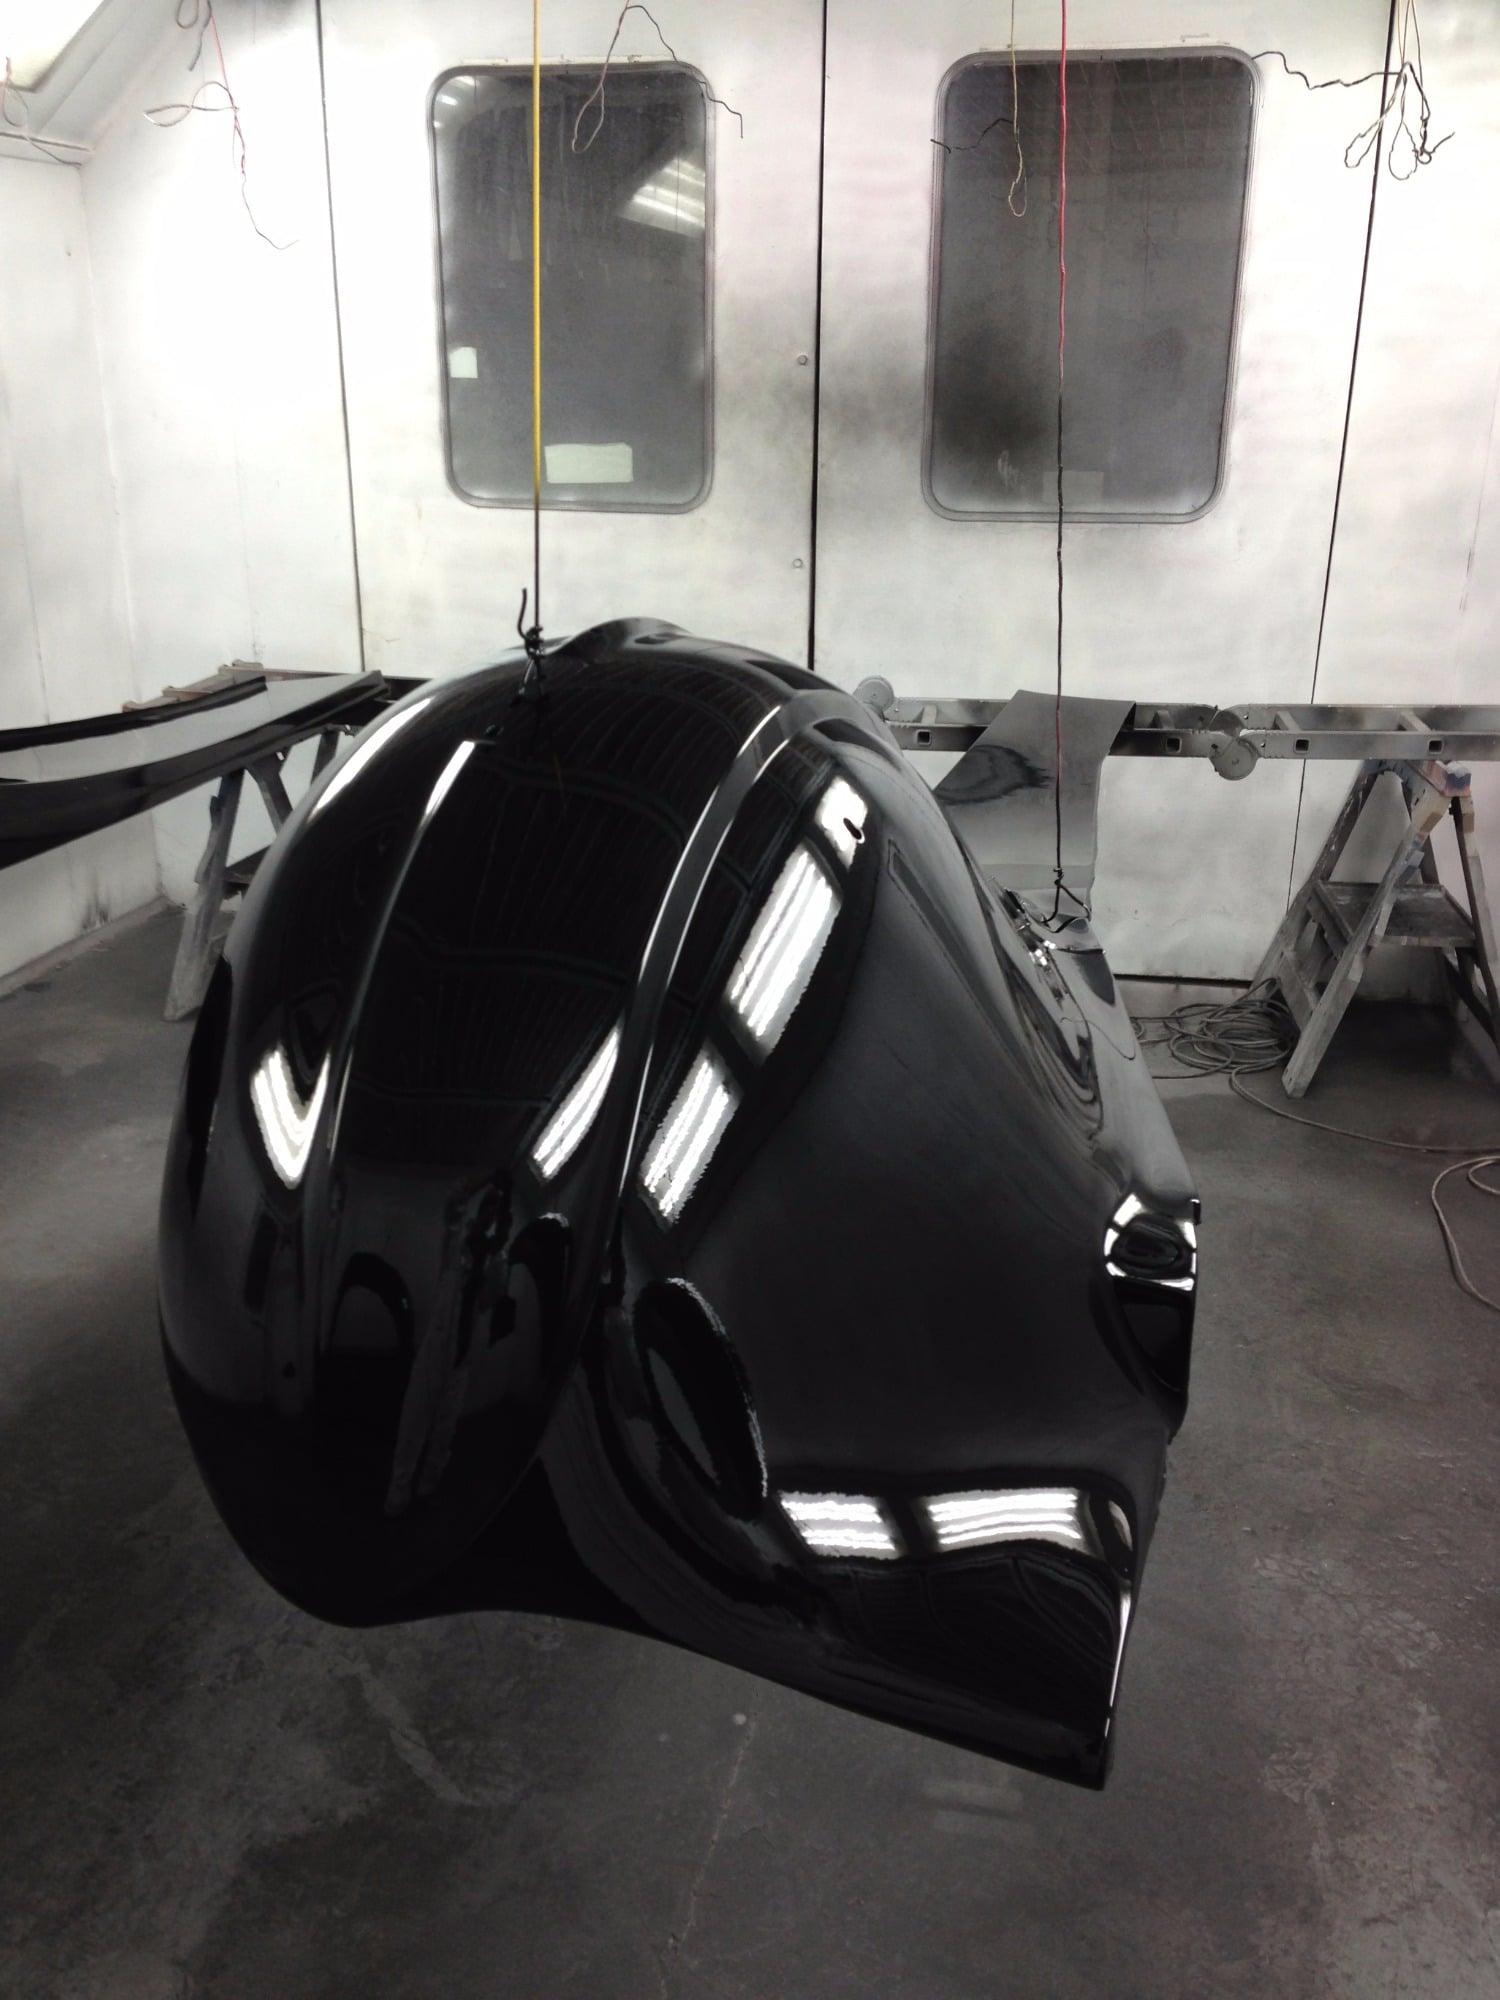 Rolls Royce Wraith - black pps